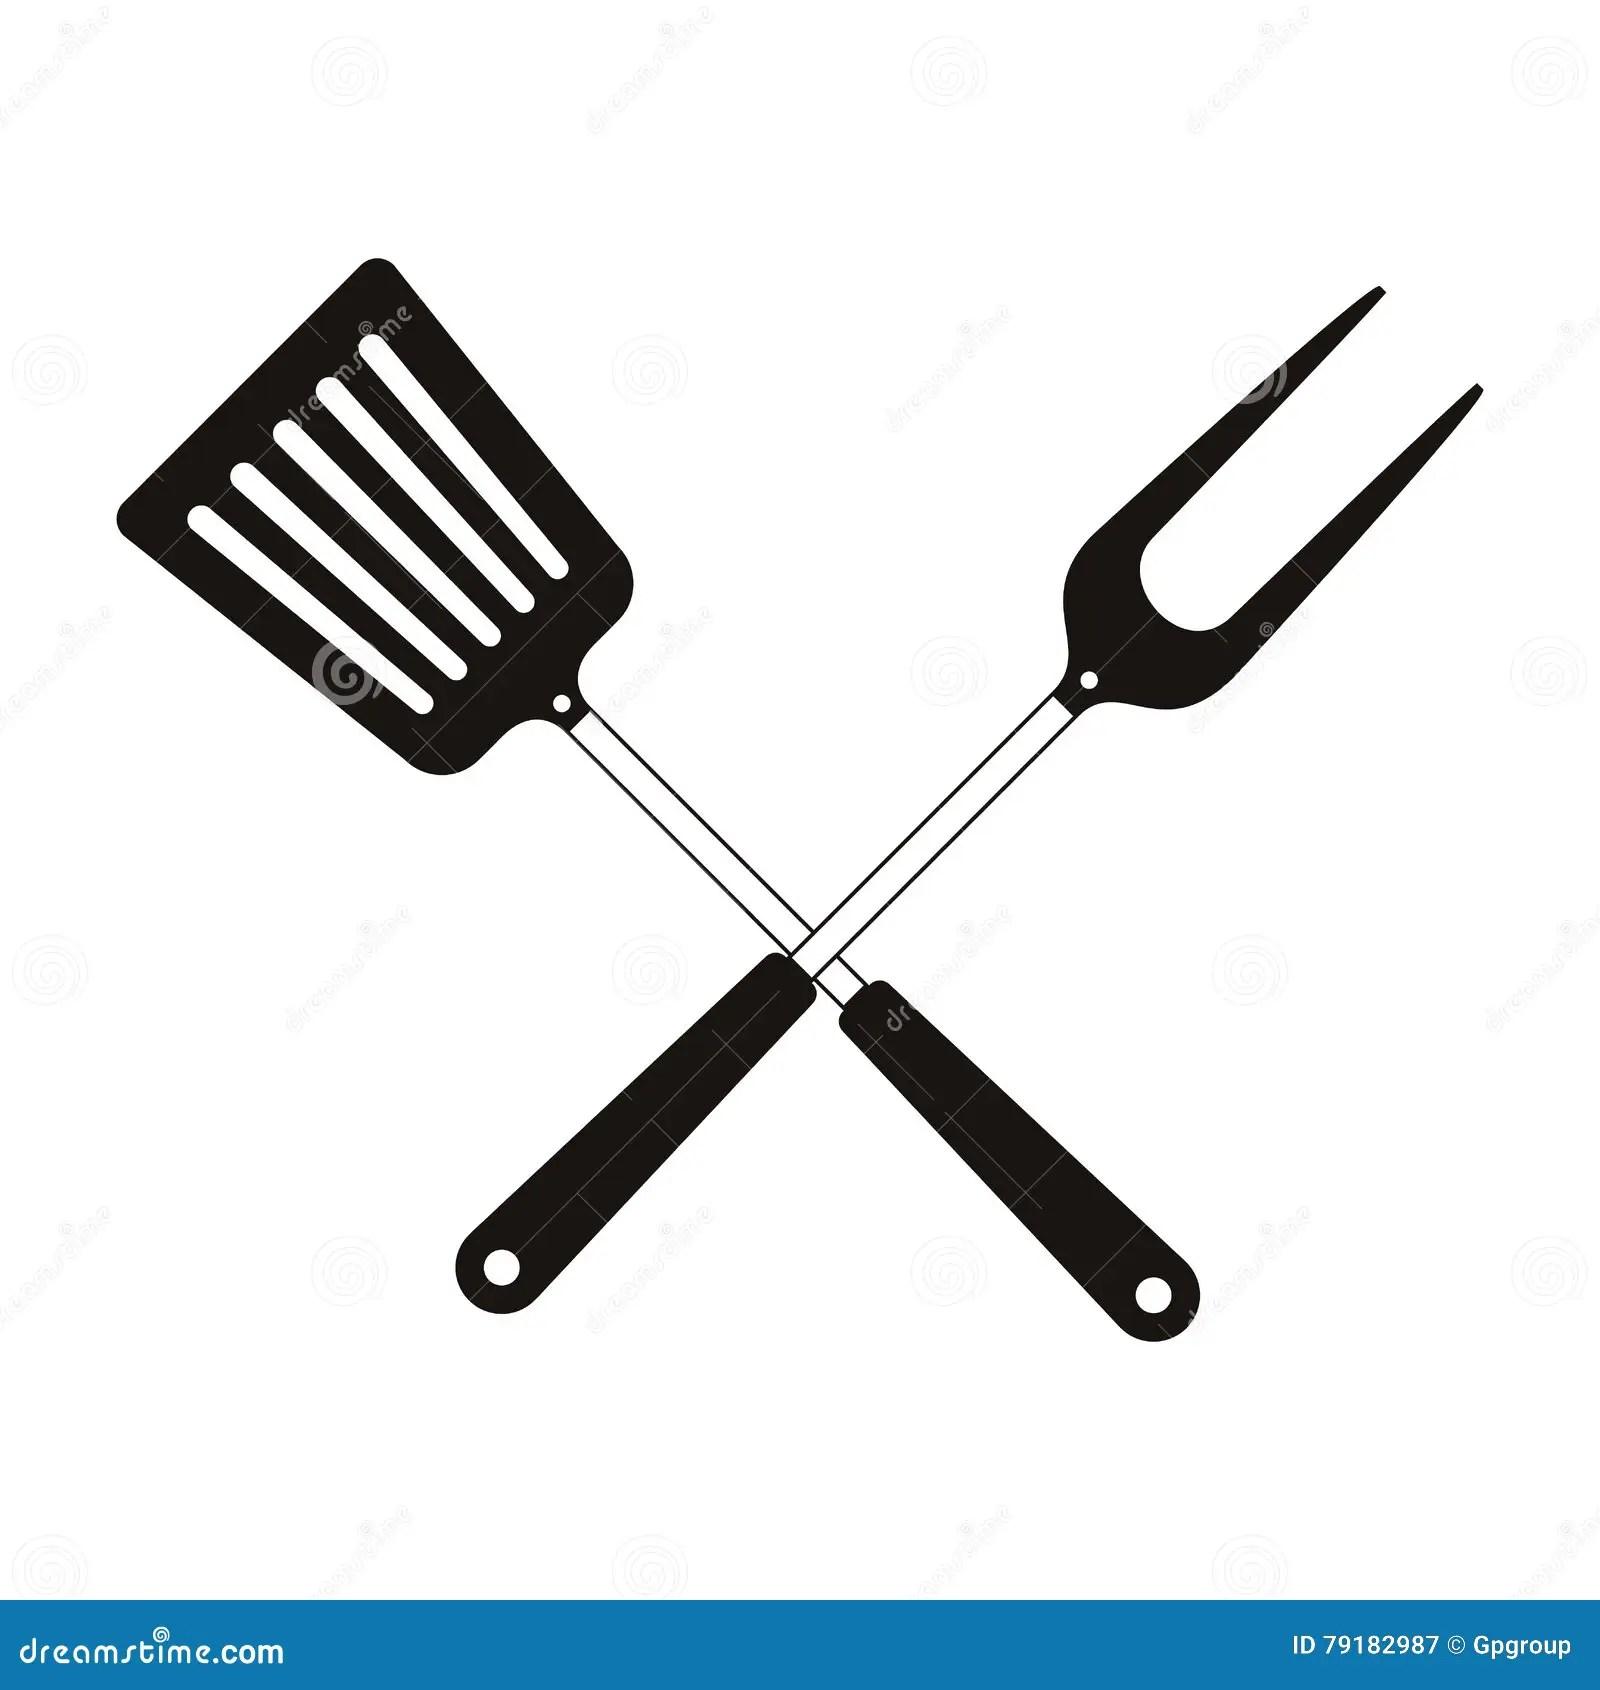 Bbq Cooking Utensils Stock Vector Illustration Of Steak